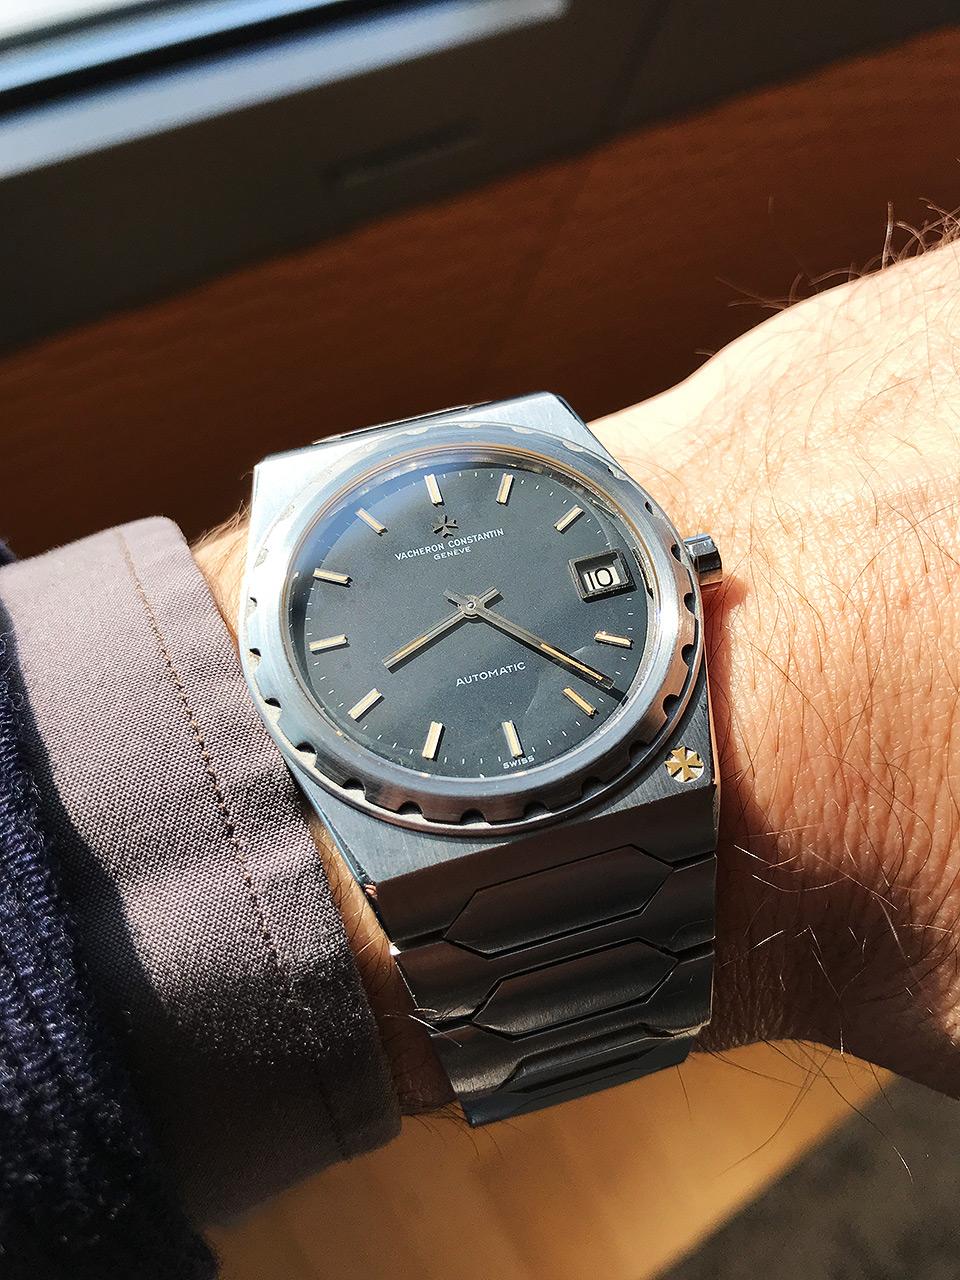 180319-vacheron-constantin-geneva-manufacture-heritage-ref-222-wrist